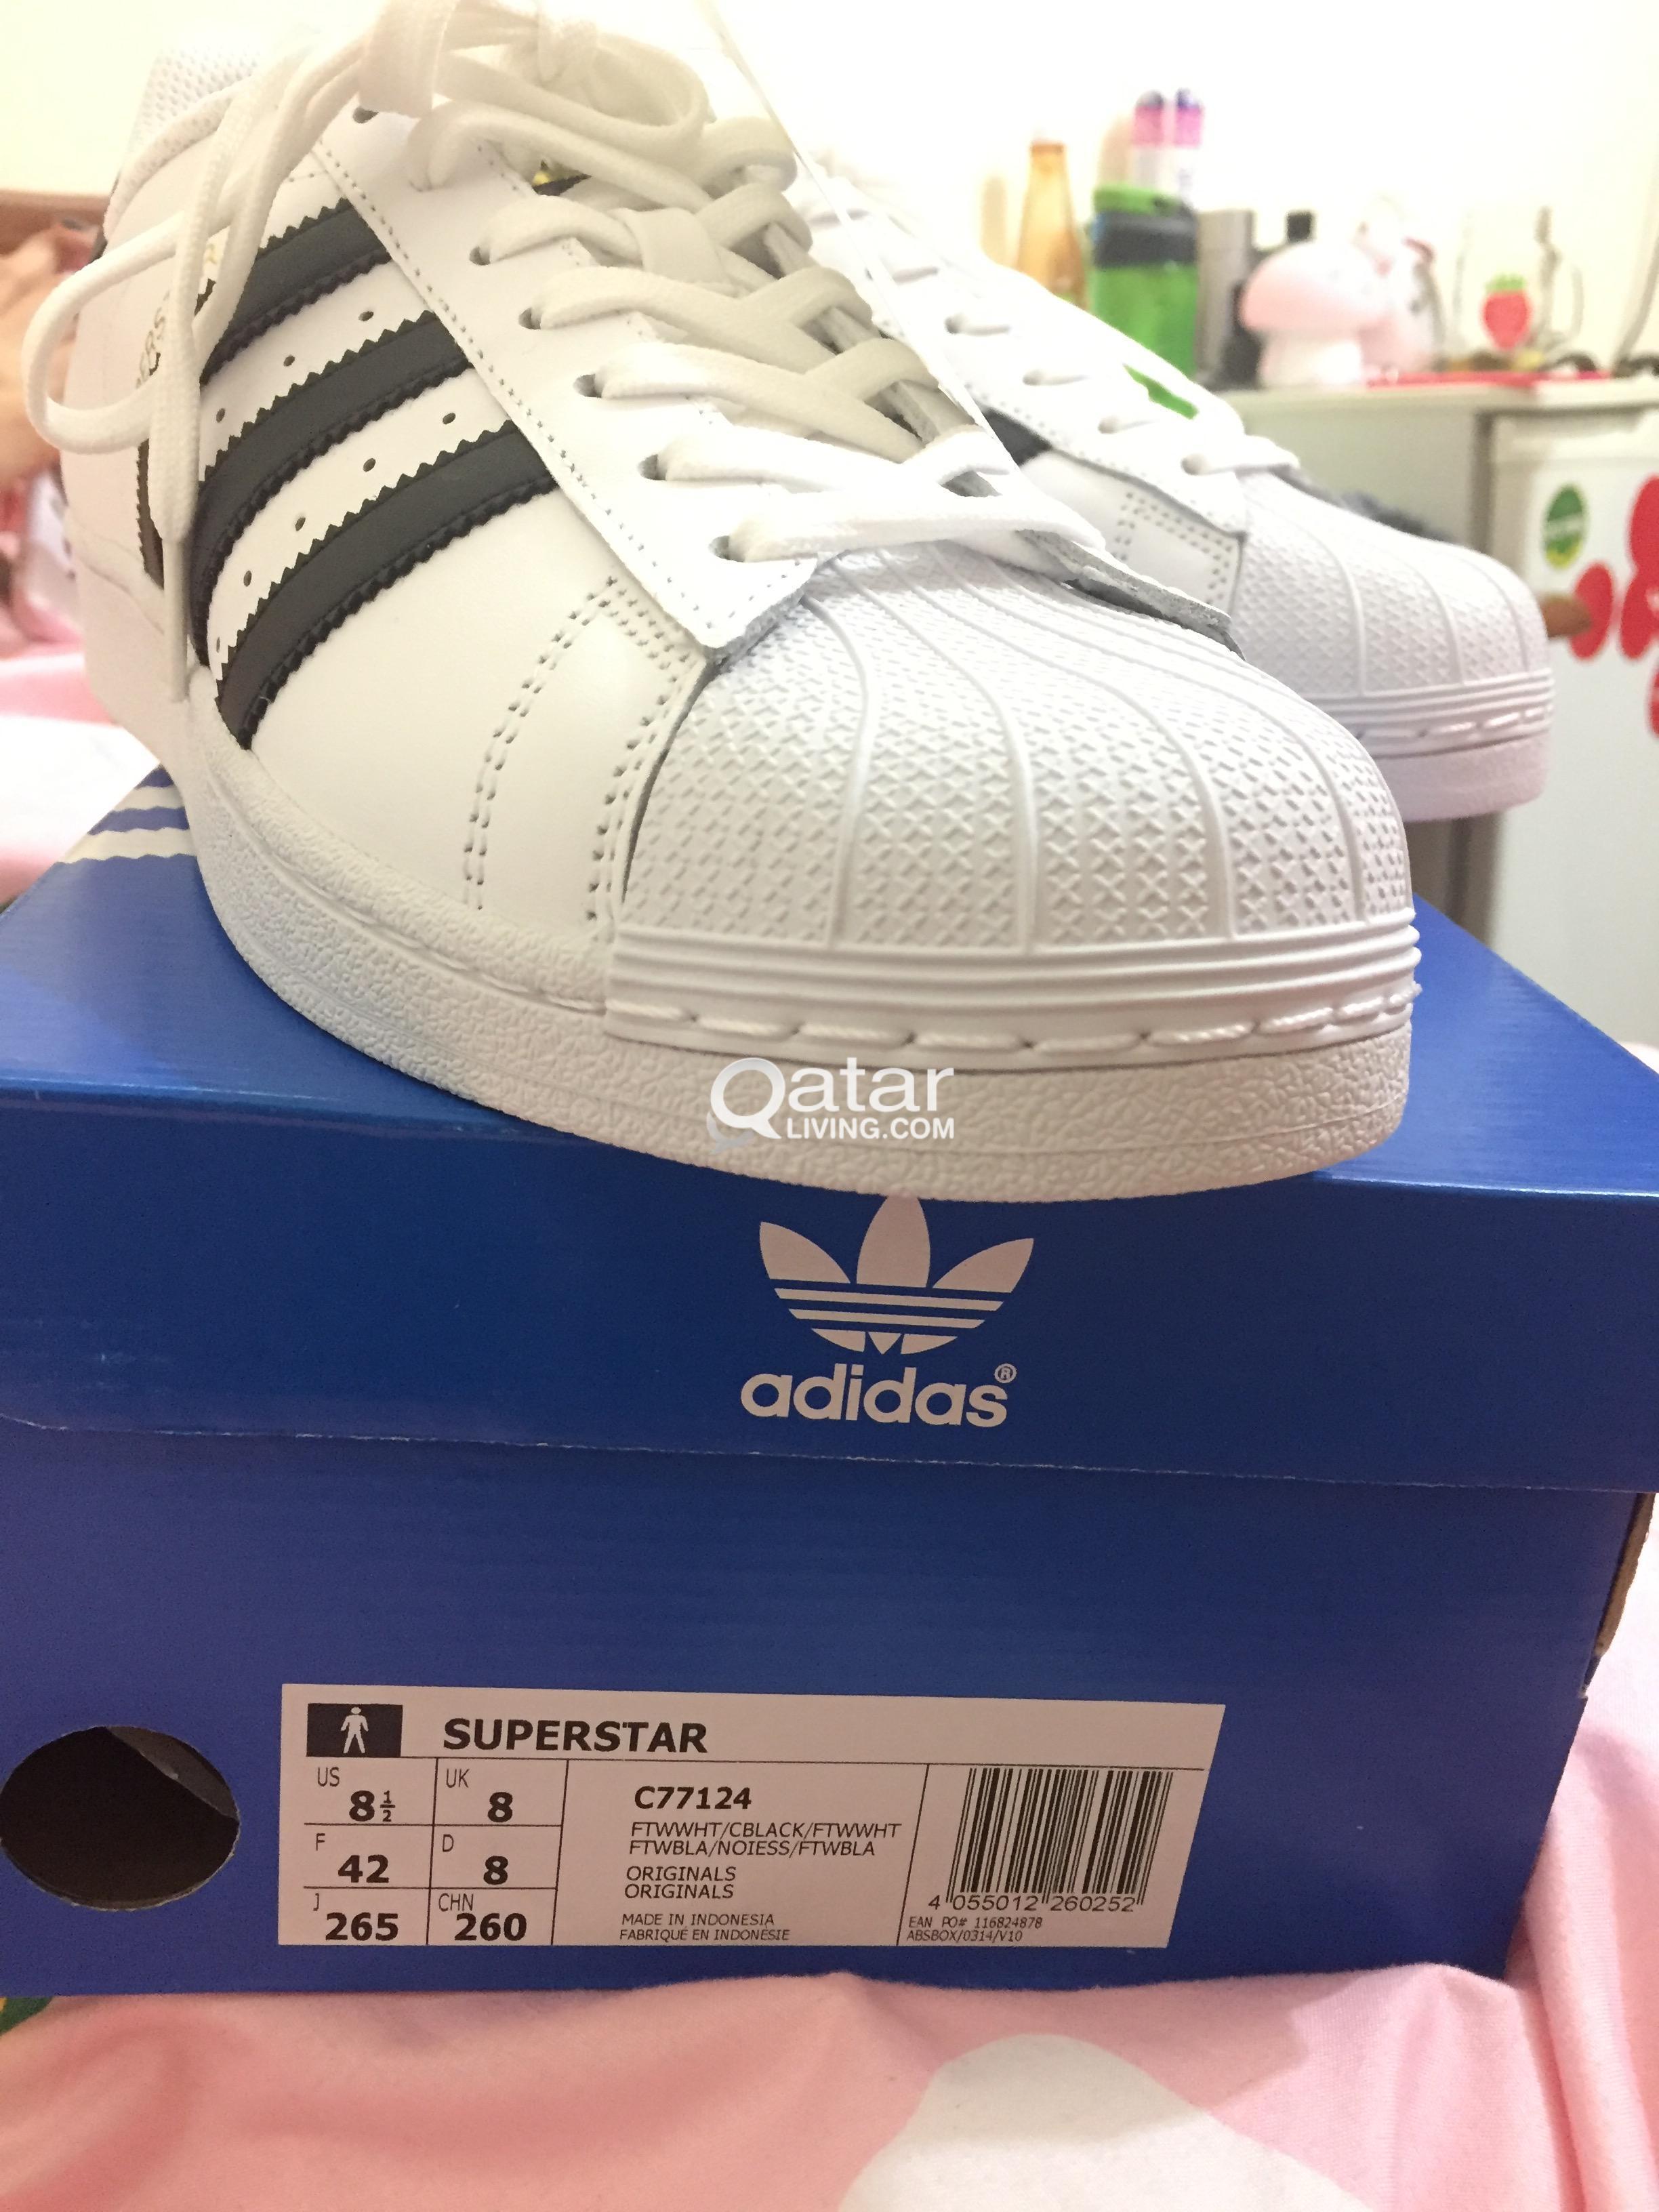 adidas superstar qatar